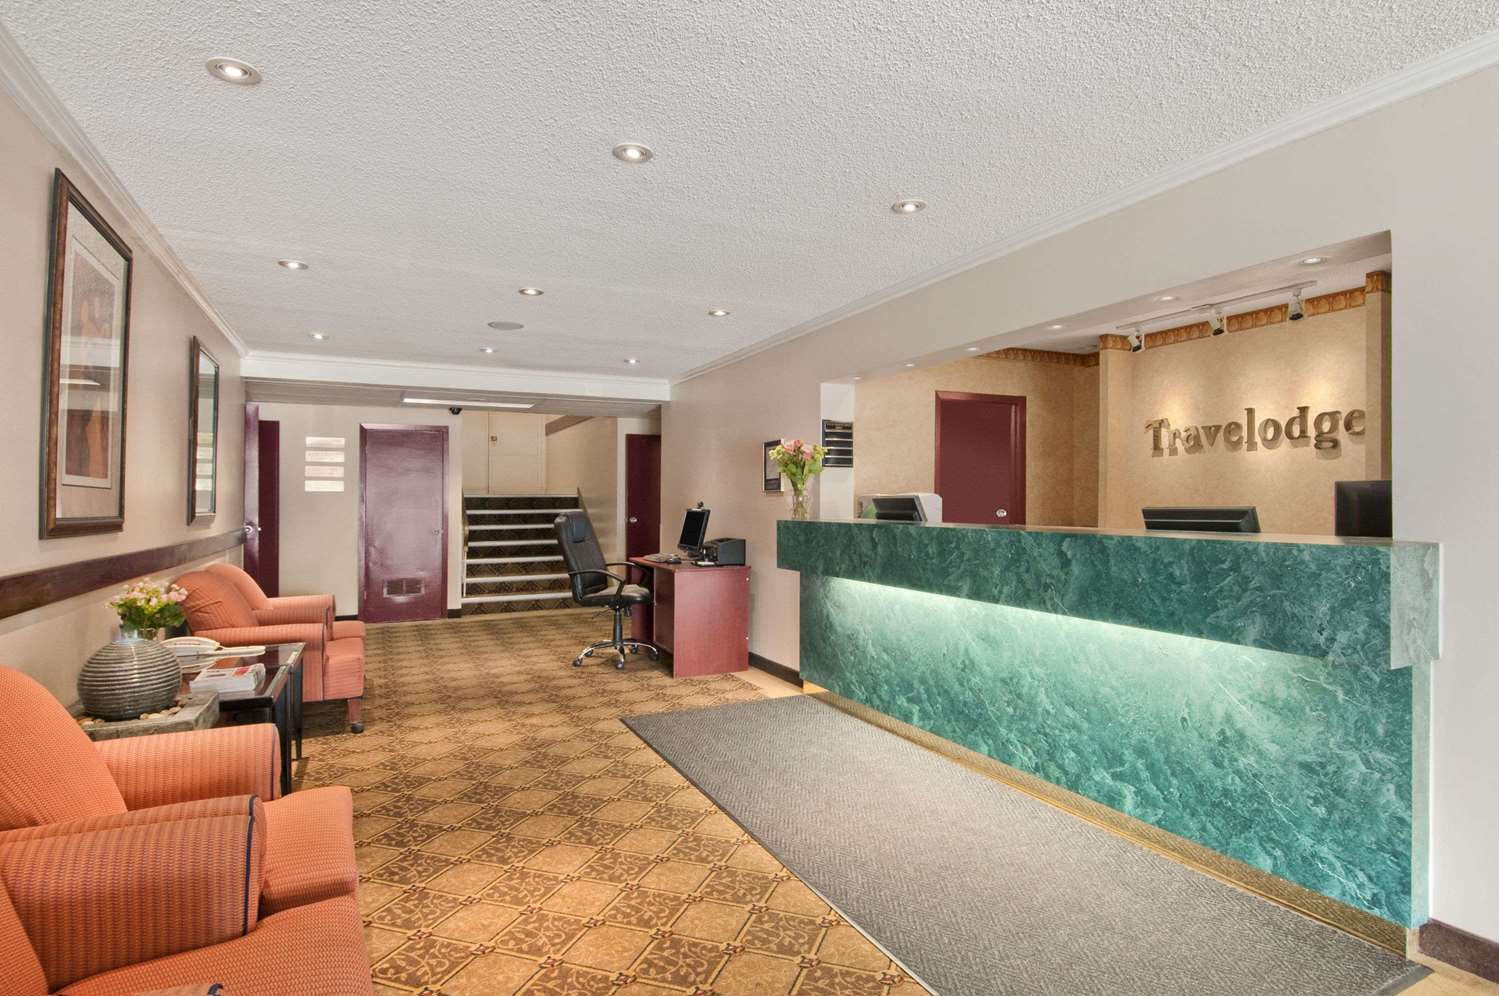 Lobby - Travelodge Nanaimo